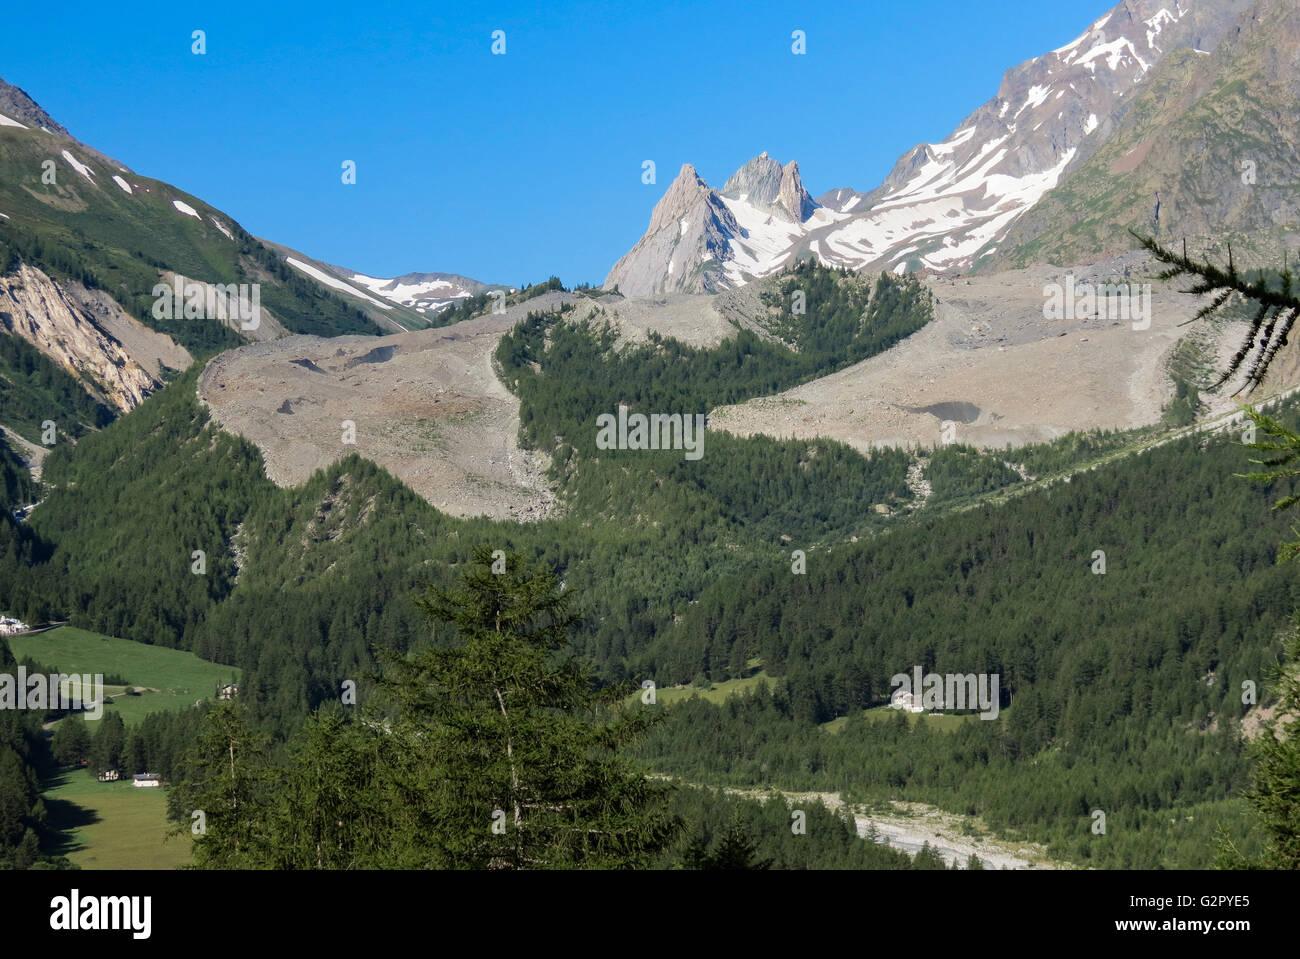 The Miage Glacier. Mont Blanc. - Stock Image